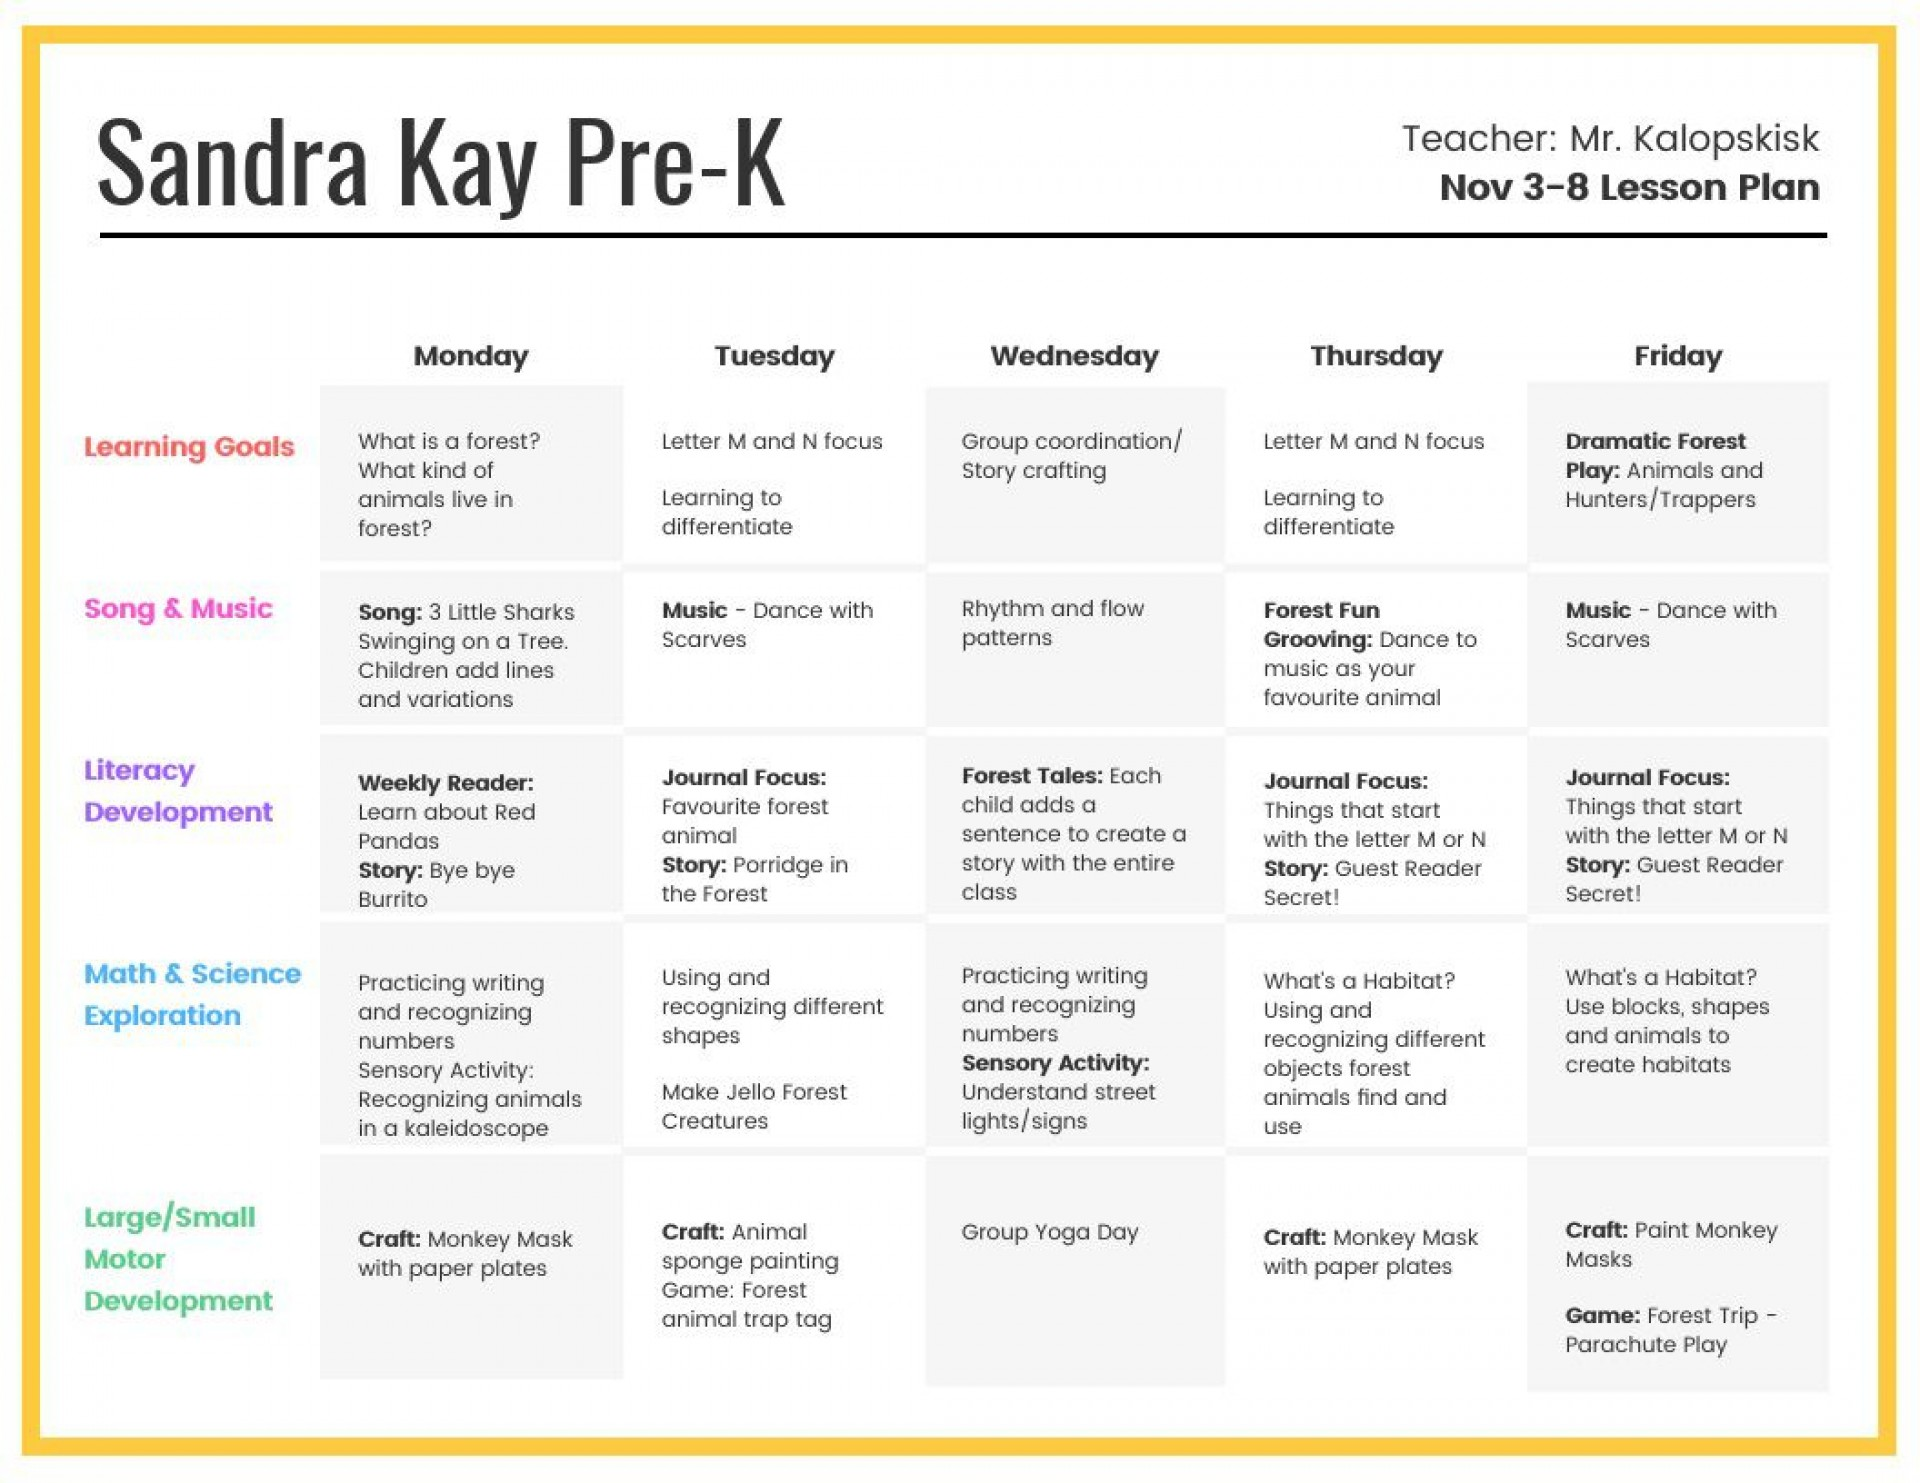 007 Astounding Preschool Weekly Lesson Plan Template High Resolution  Editable Pdf Word1920